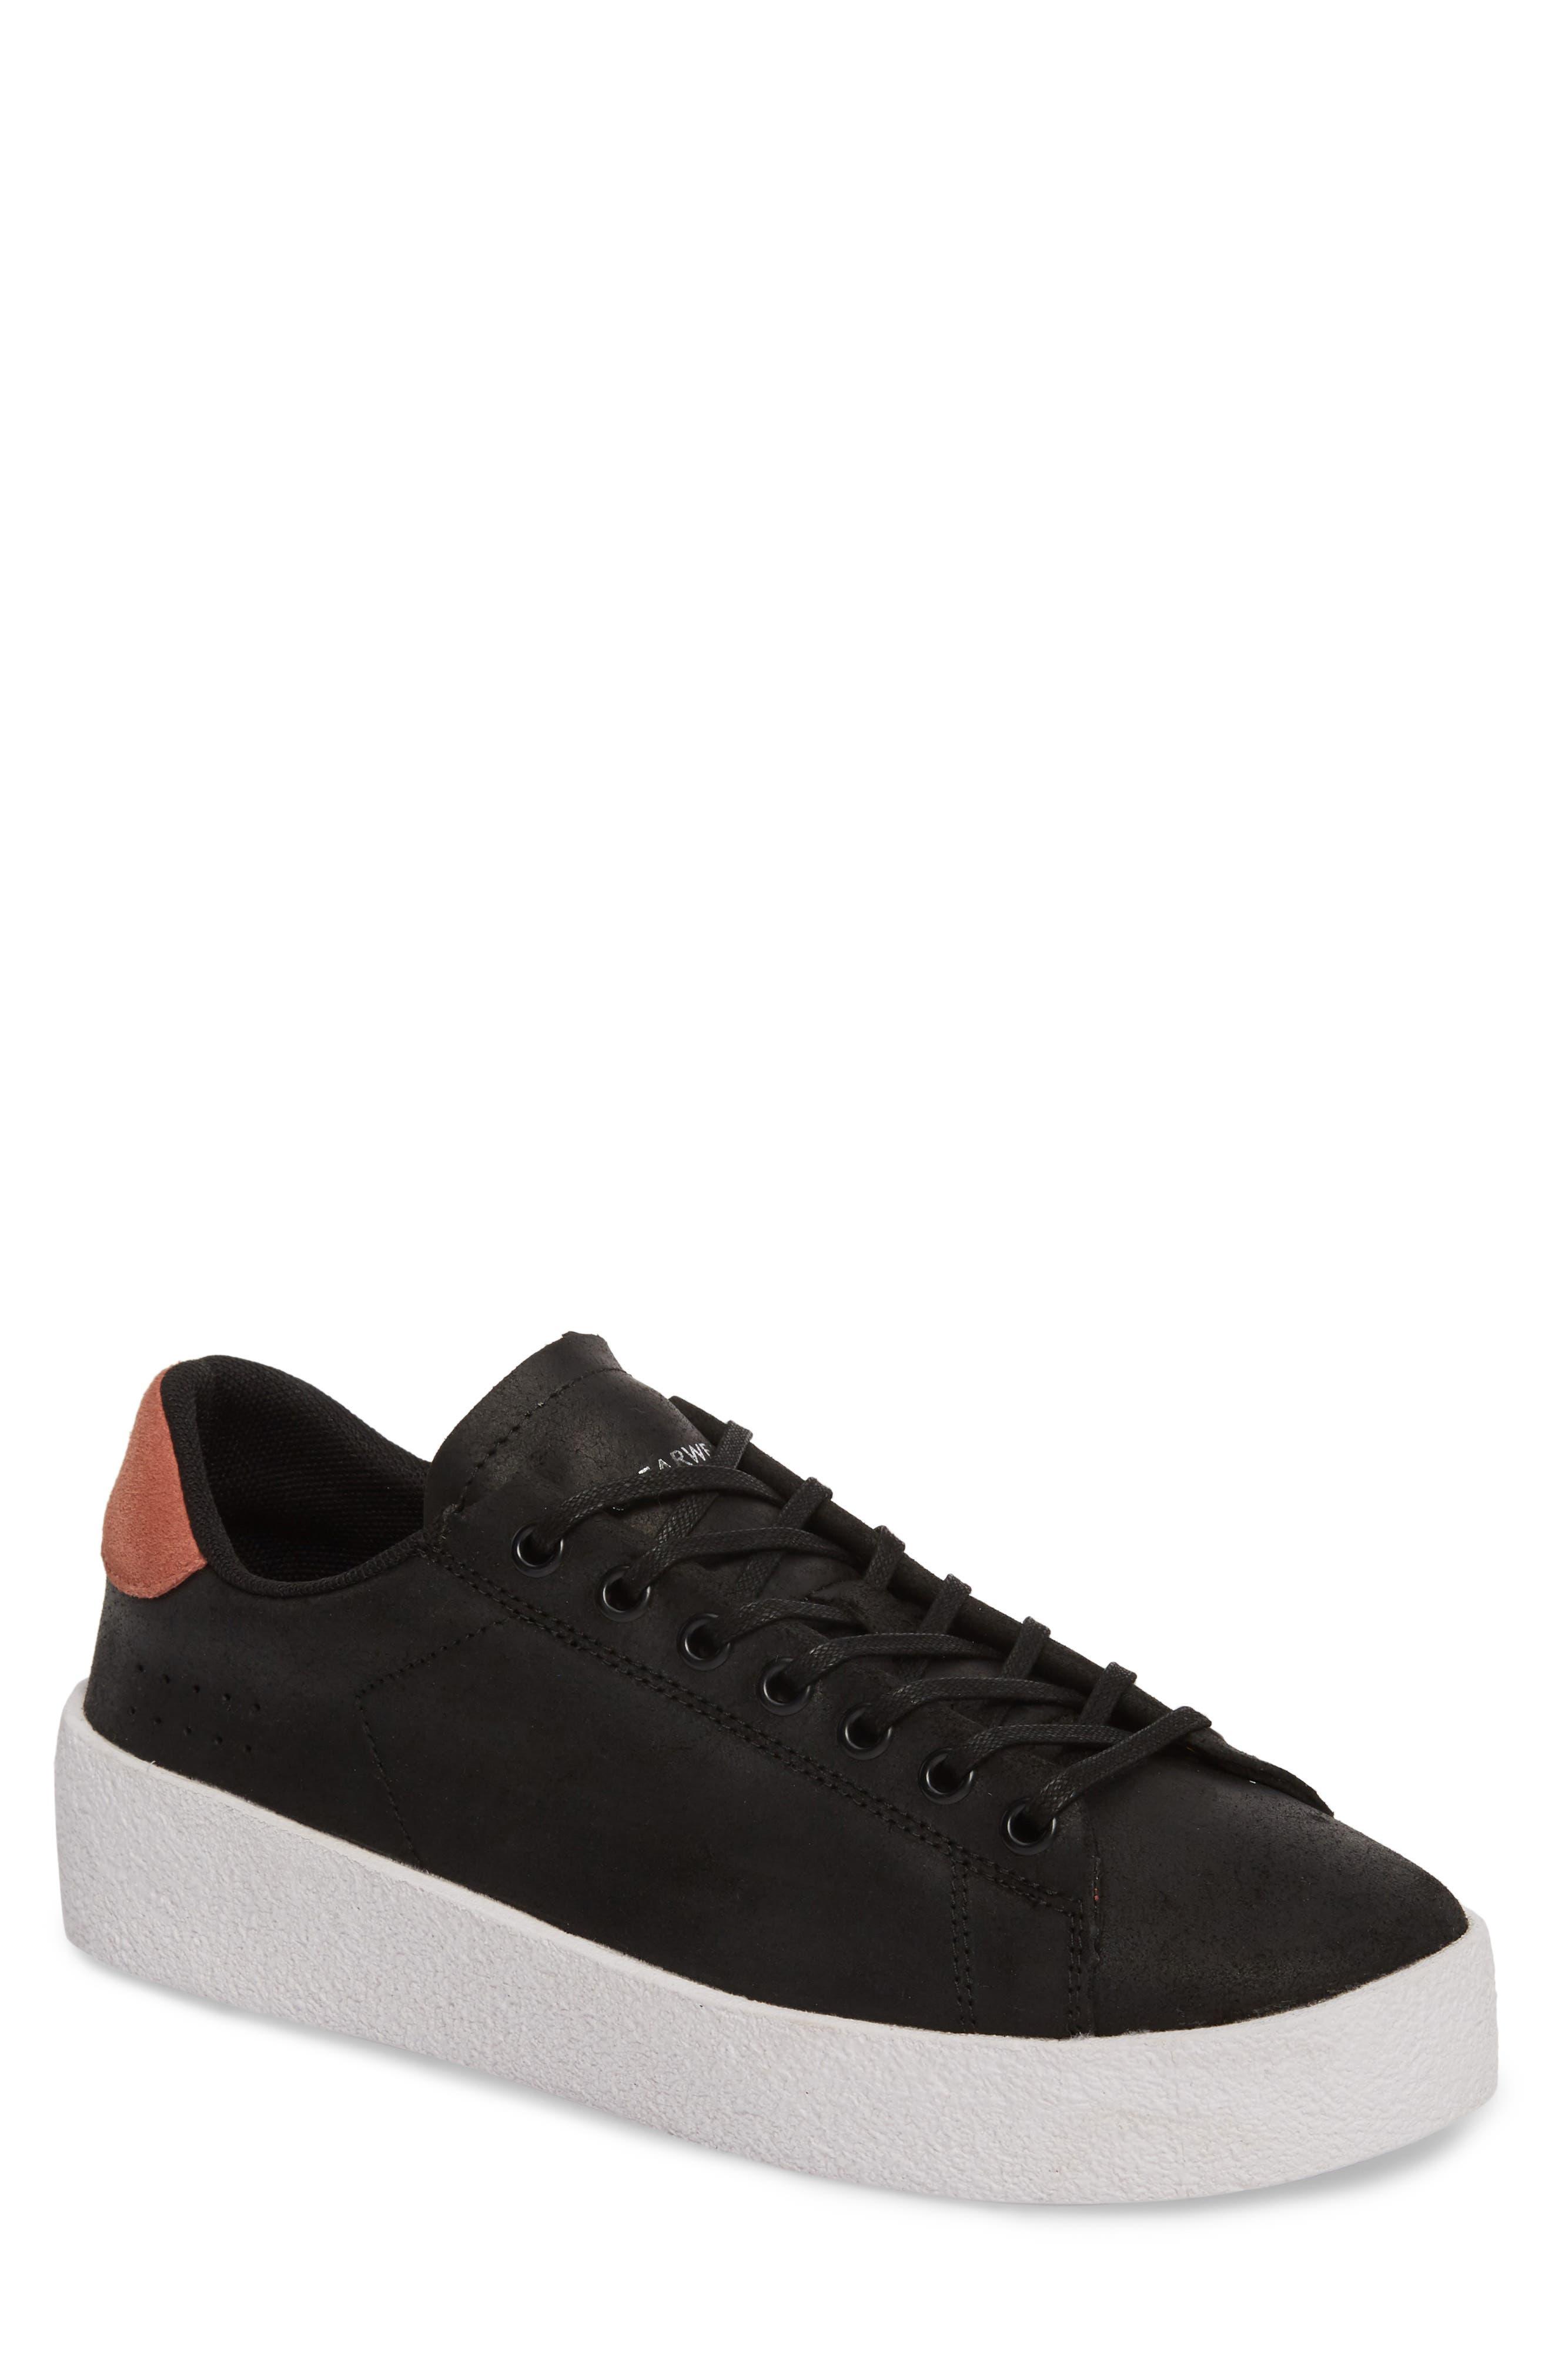 Jones Platform Sneaker,                         Main,                         color, Black Leather